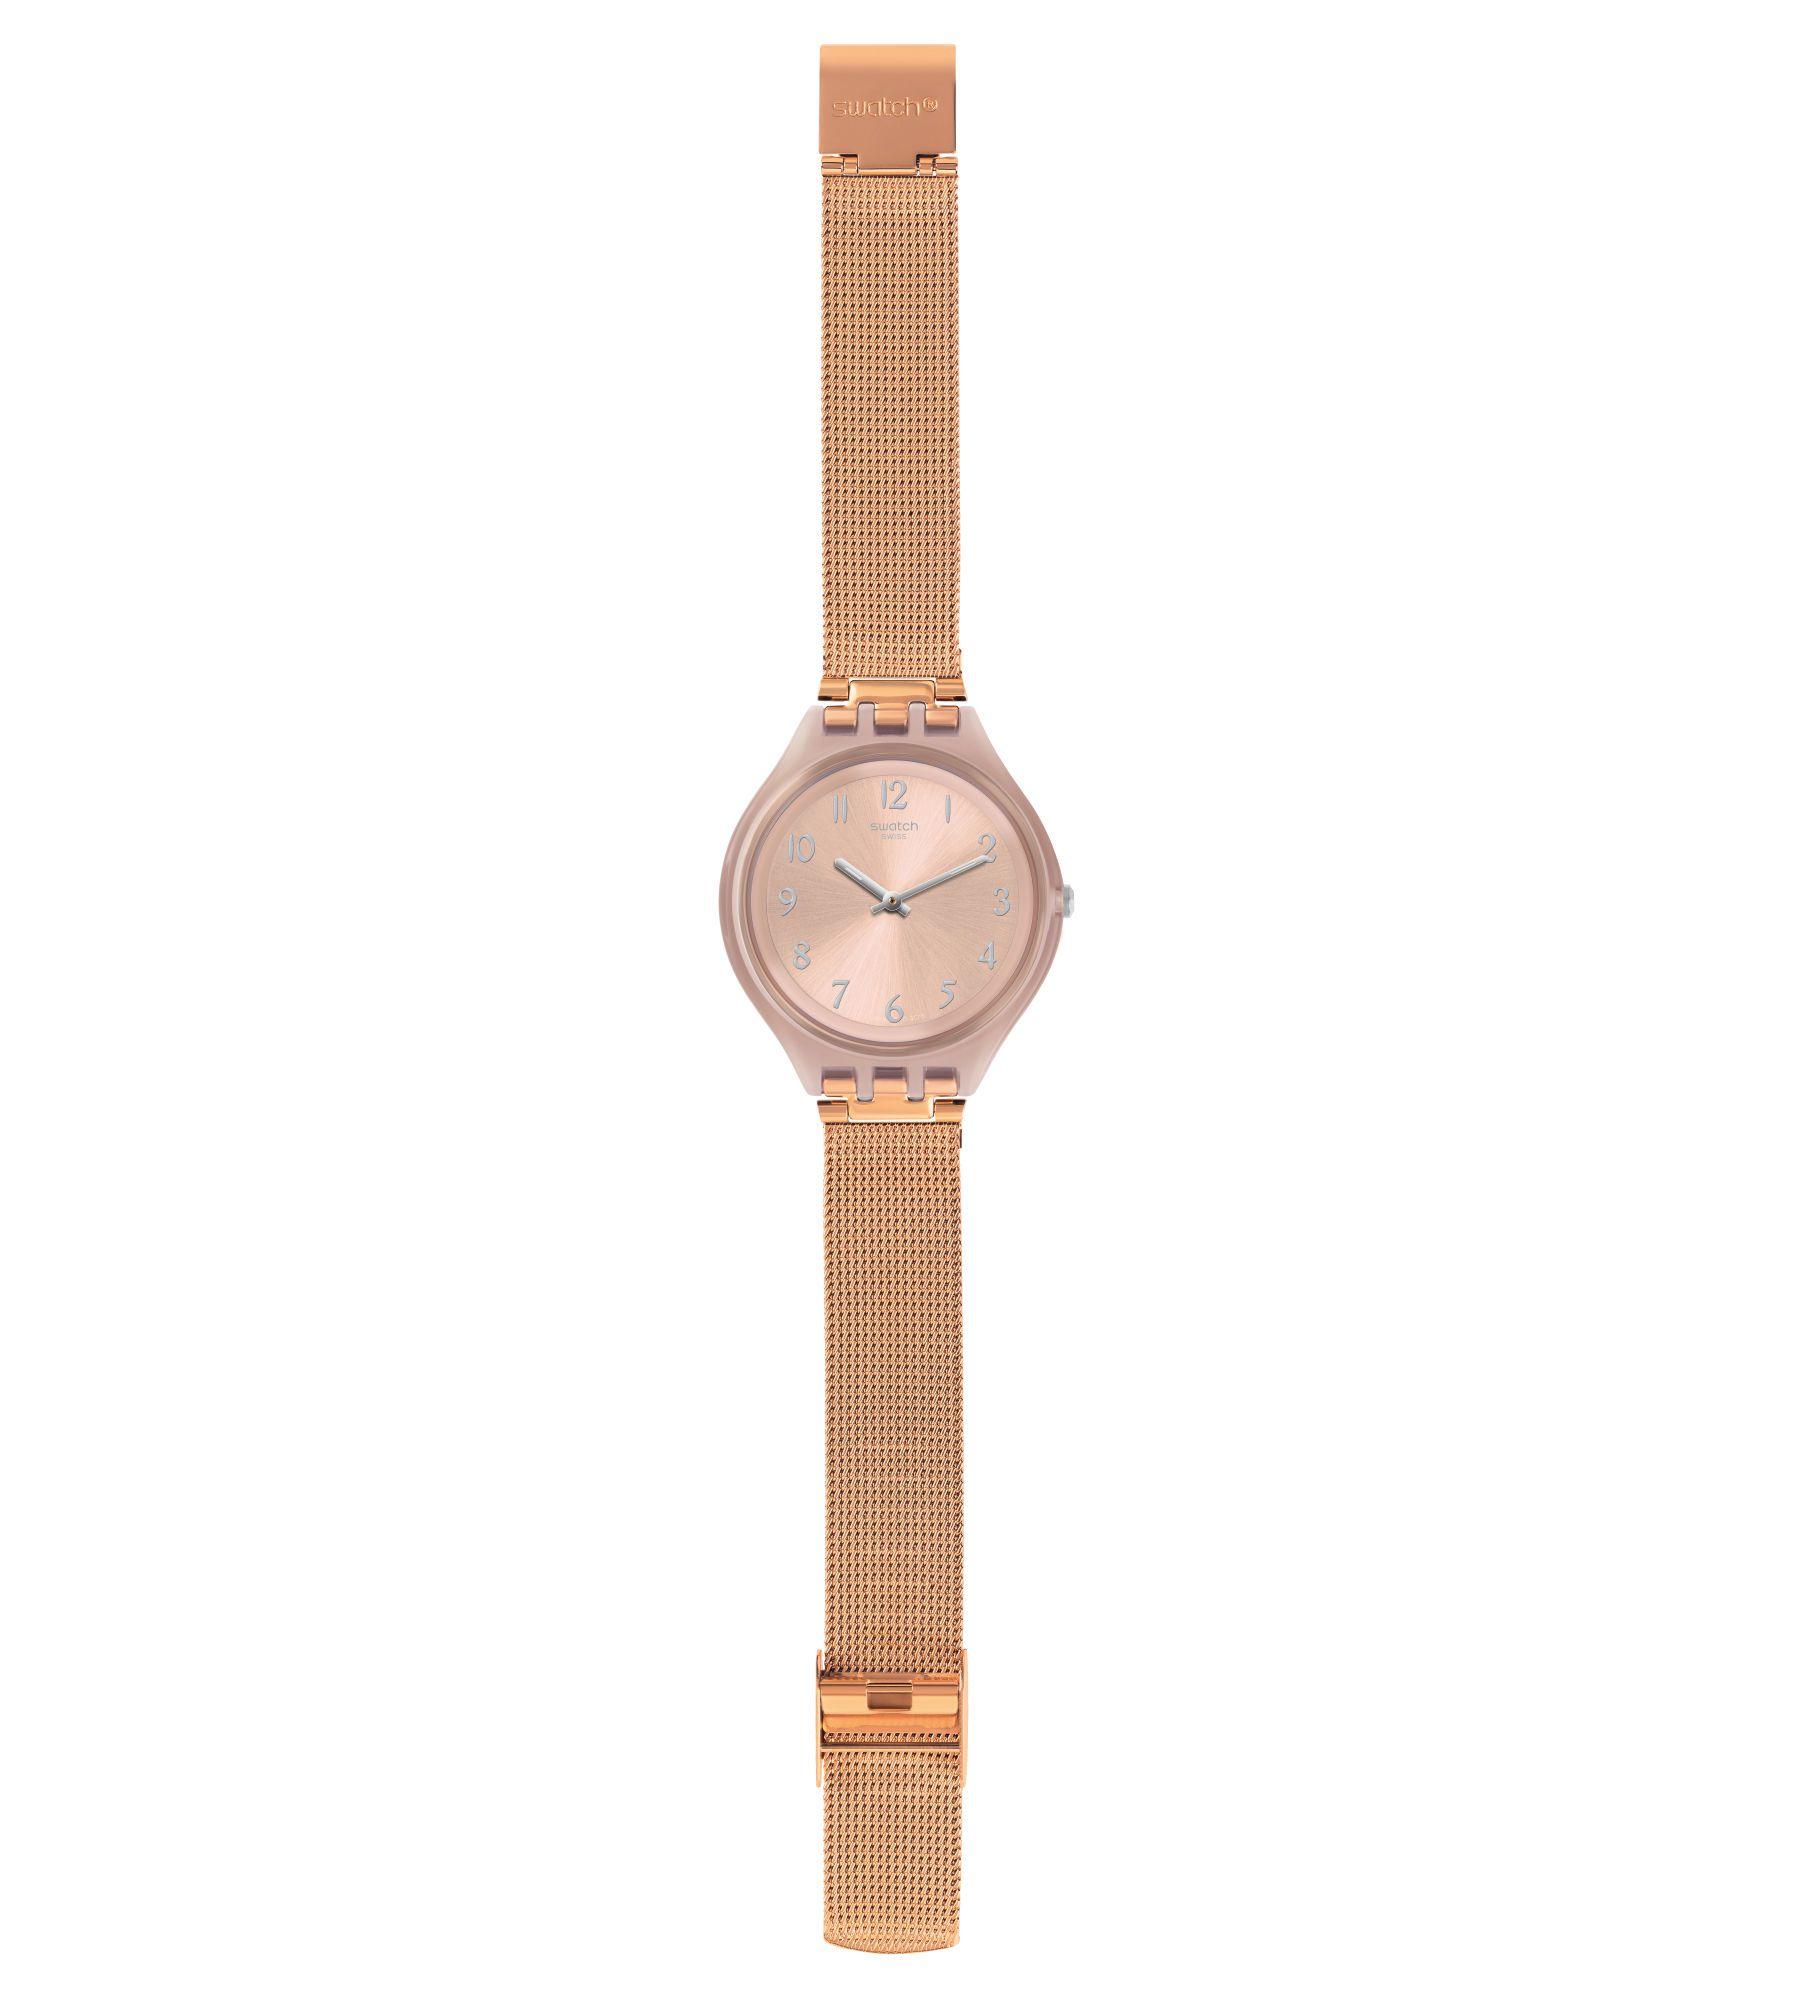 Relógio Swatch Feminino Rosè - Skinchic - SVUP100M